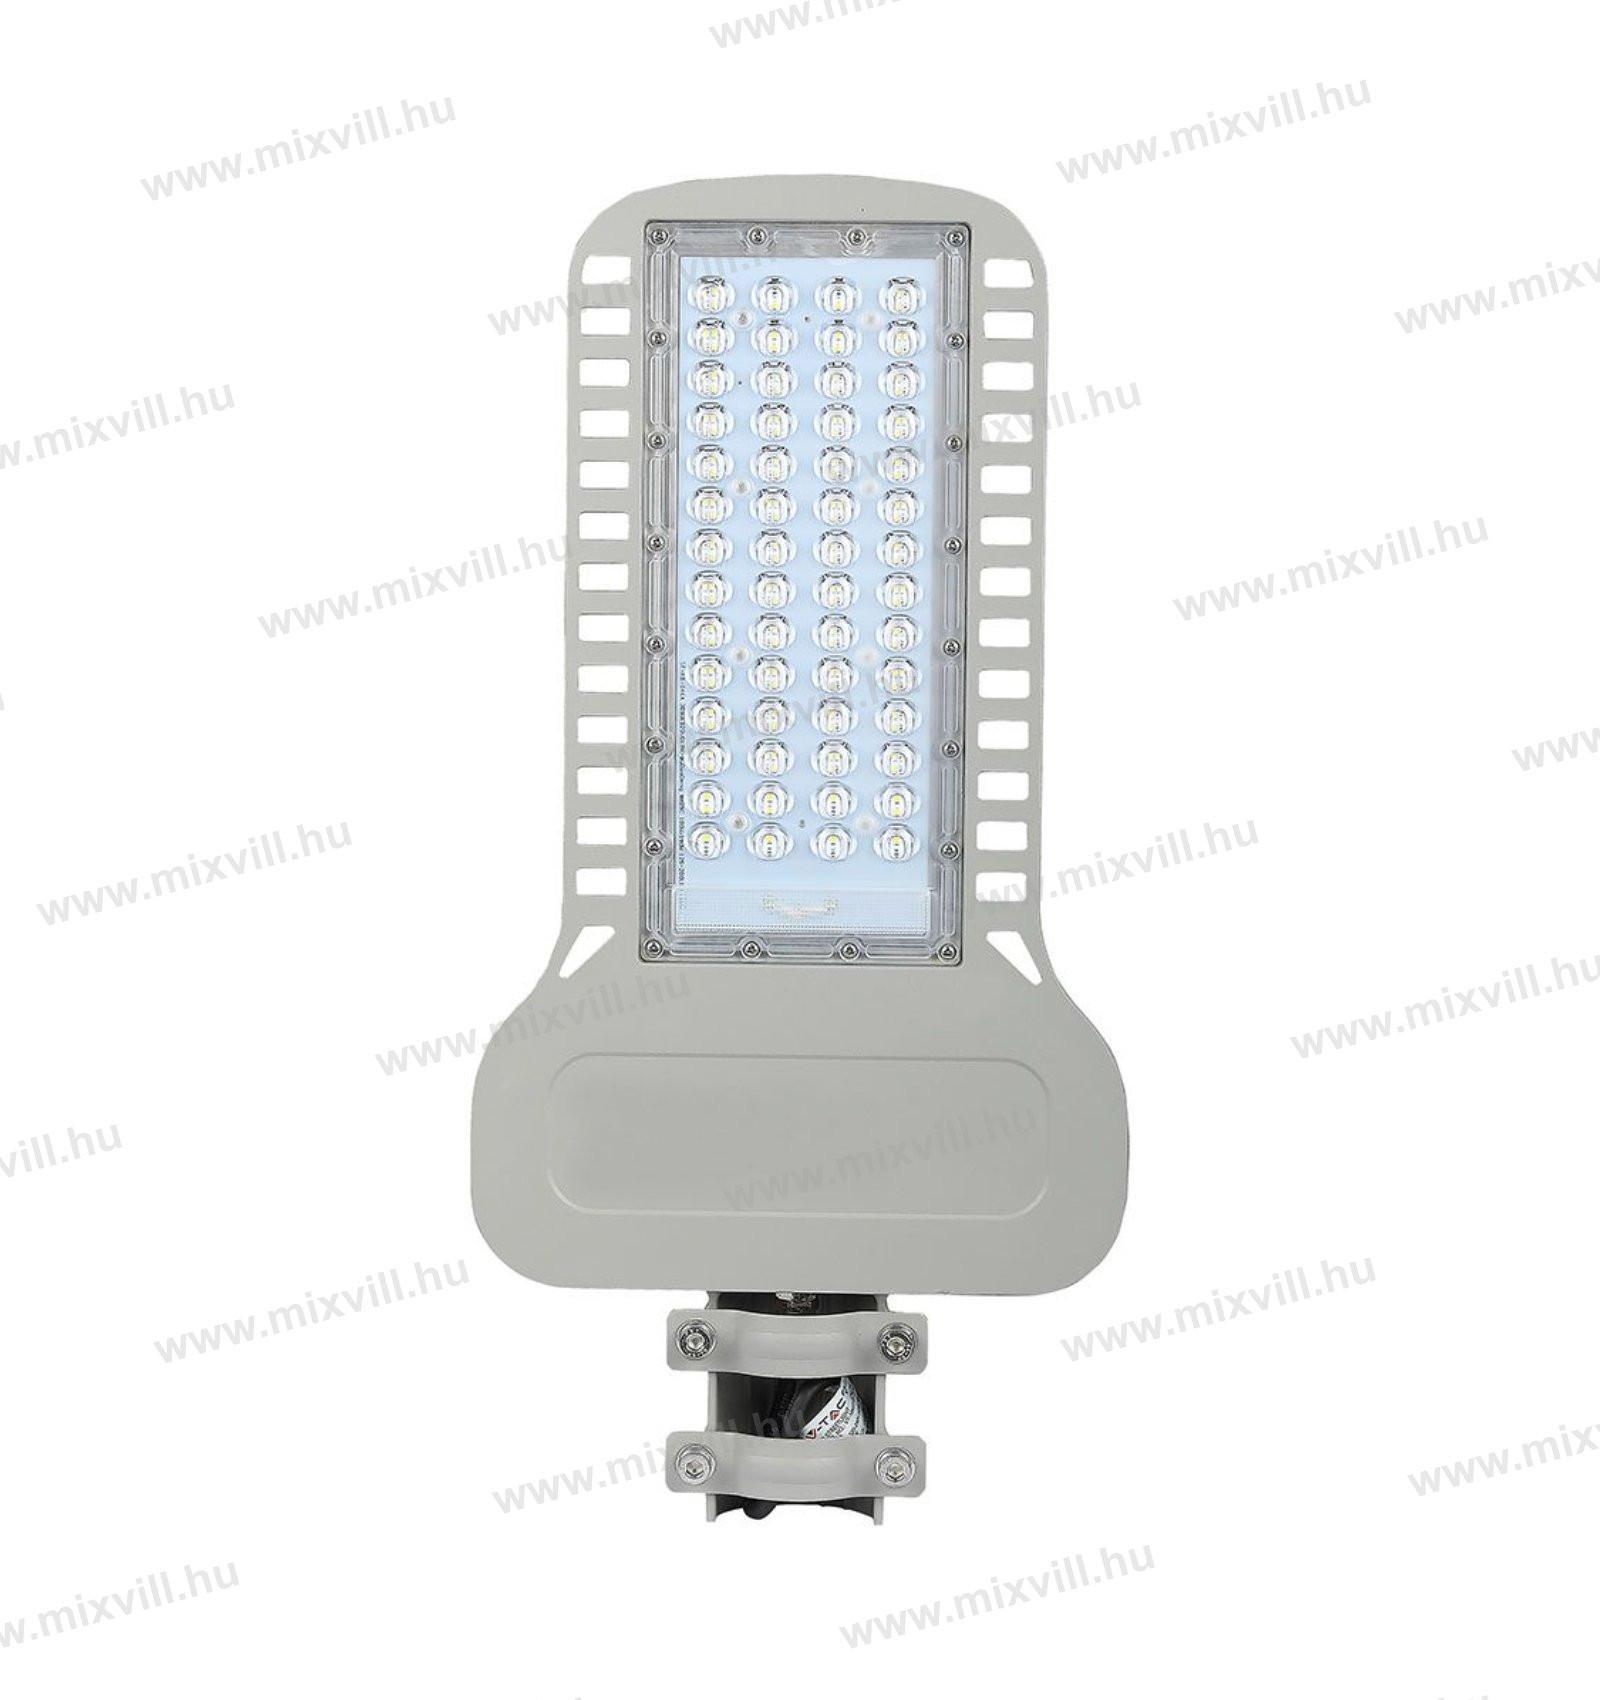 V-TAC-SKU-960-samsung-chip-Led-kozvilagitasi-lampa-100W-semleges-feher-utcalampa